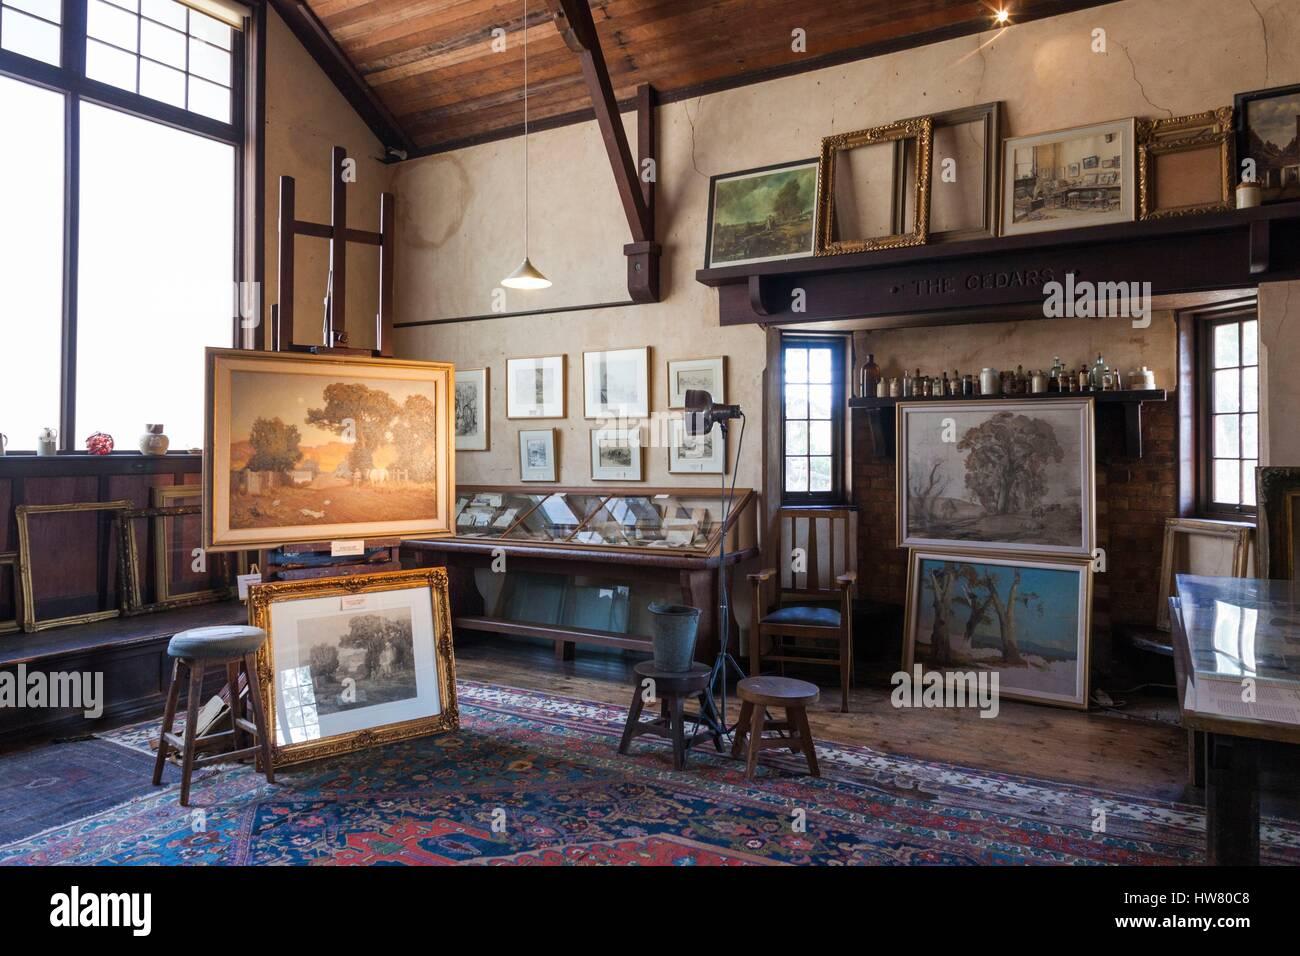 Australia, South Australia, Adelaide Hills, Hahndorf, The Cedars, former studio of landscape painter Hans Heysen, Stock Photo